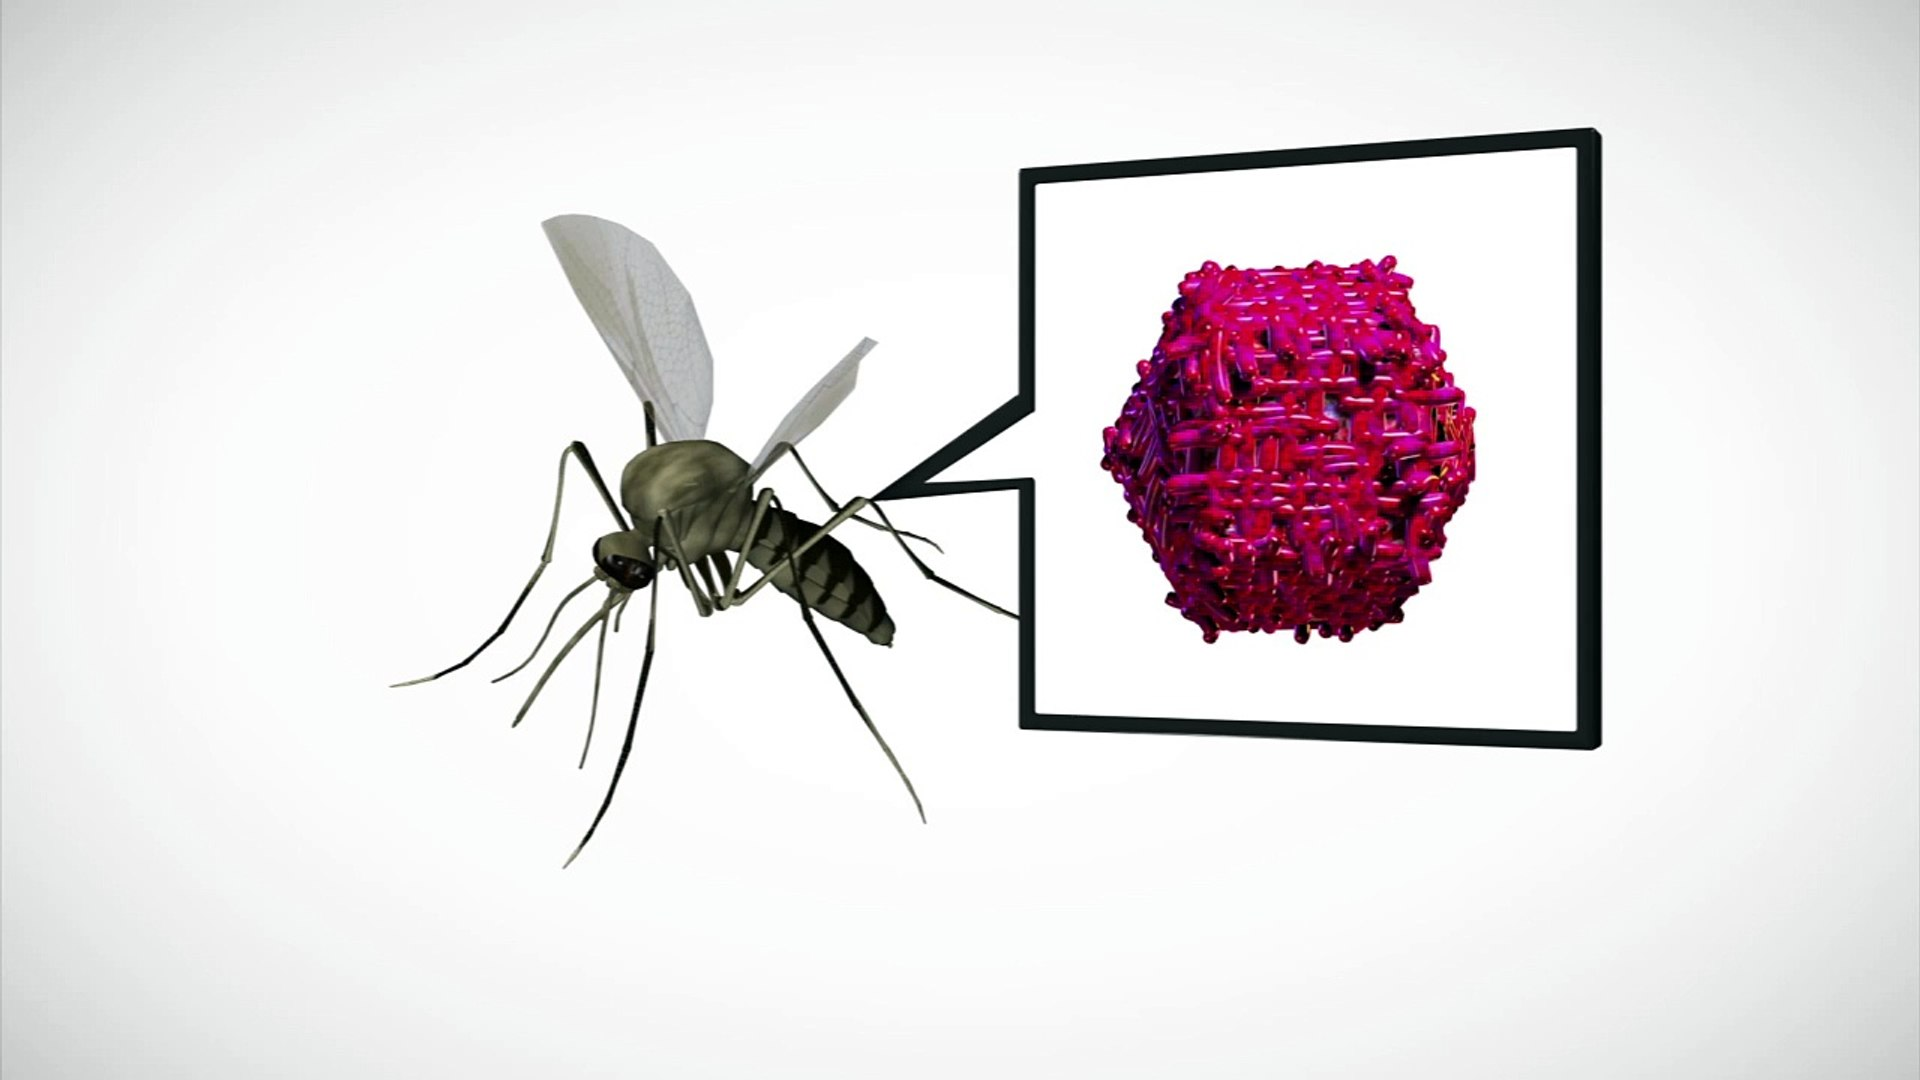 West Nile virus: How the virus spreads